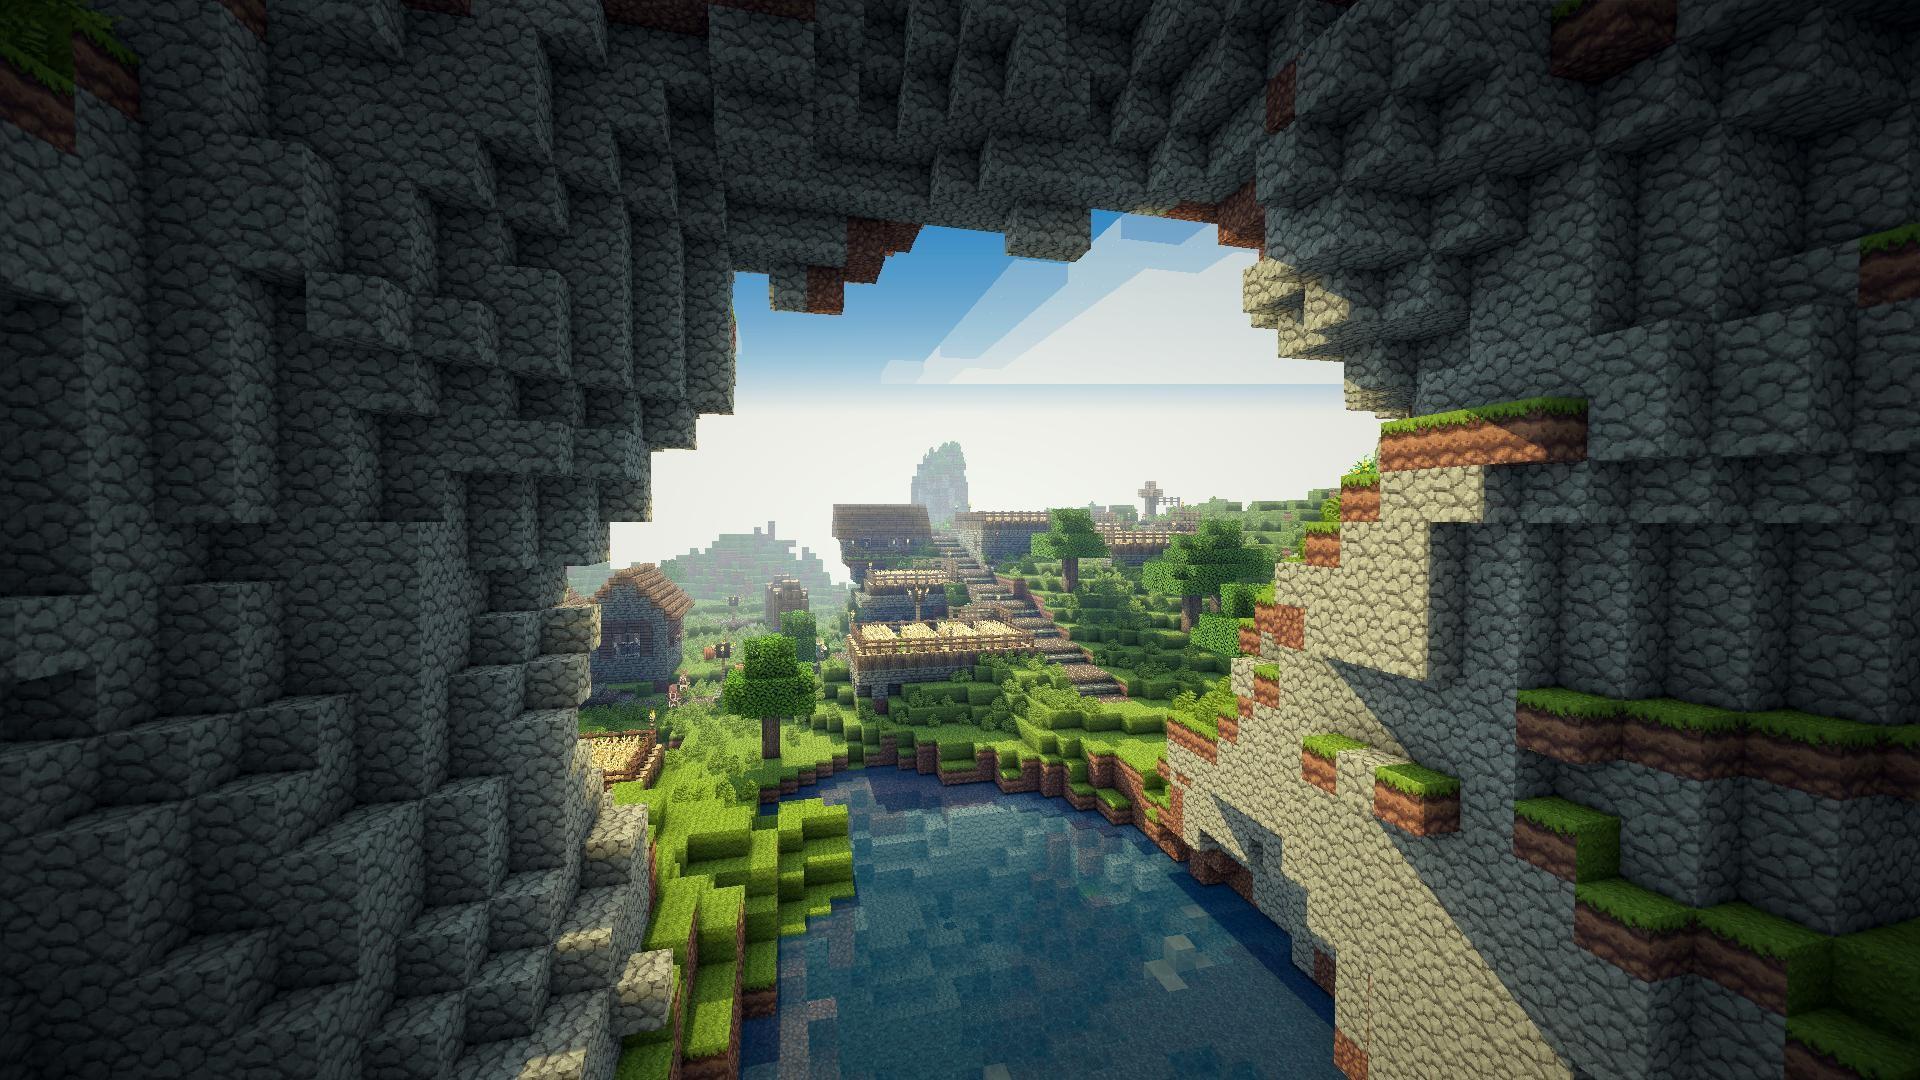 Fantastic Wallpaper Minecraft Windows 8 - 311772-minecraft-wallpapers-1920x1080-windows-xp  Gallery_646688.jpg